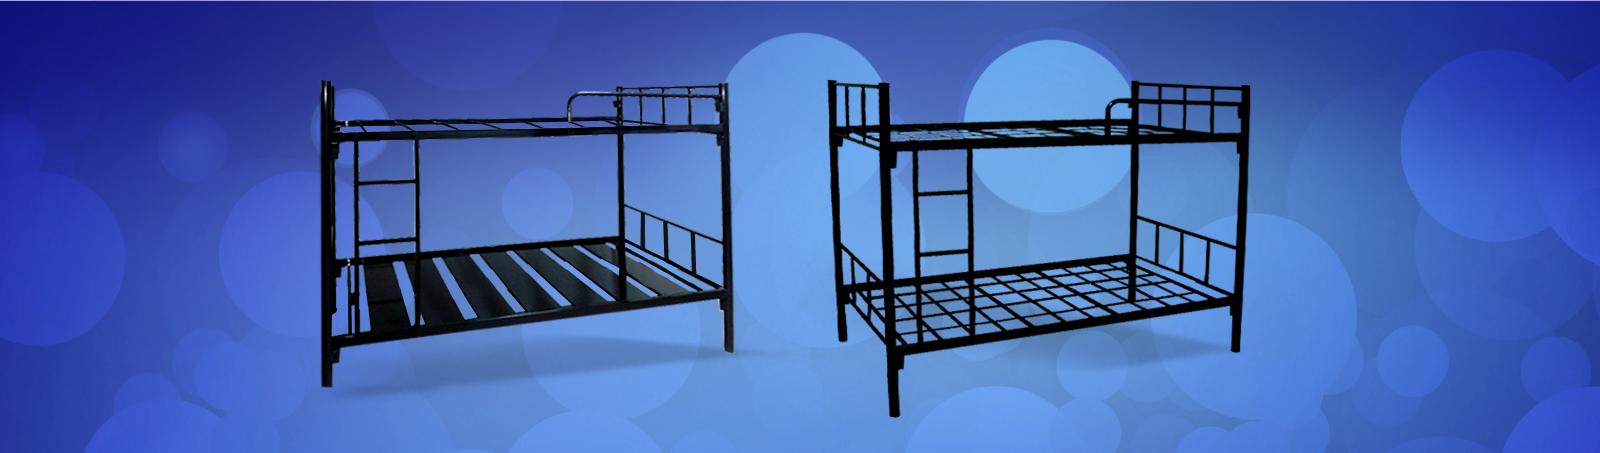 Steel Beds Supplier in in UAE and Gulf Region